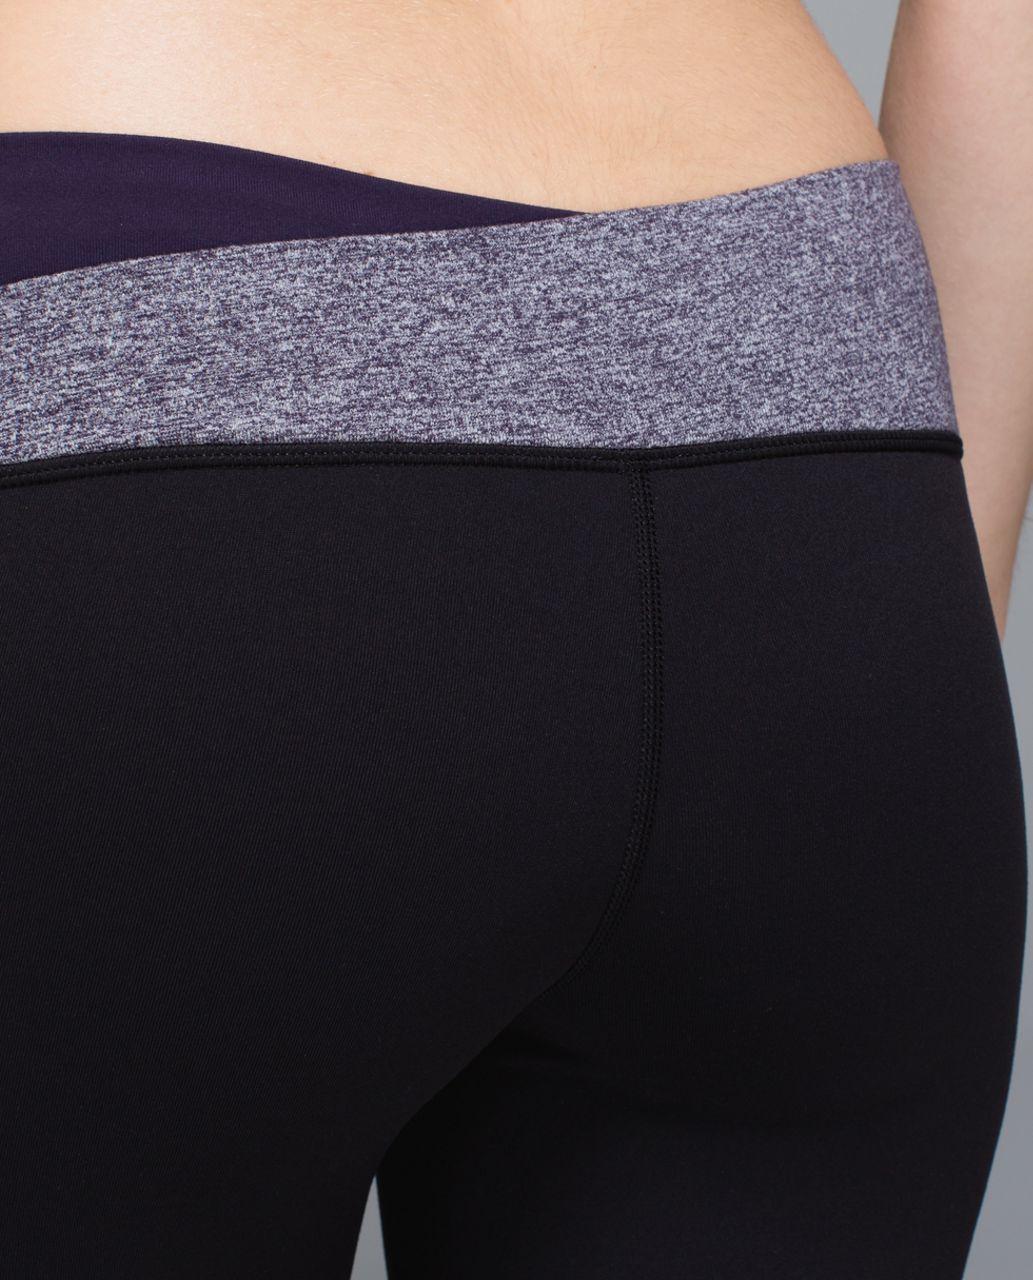 Lululemon Astro Pant *Full-On Luon (Tall) - Black / Heathered Black Grape / Going Grape